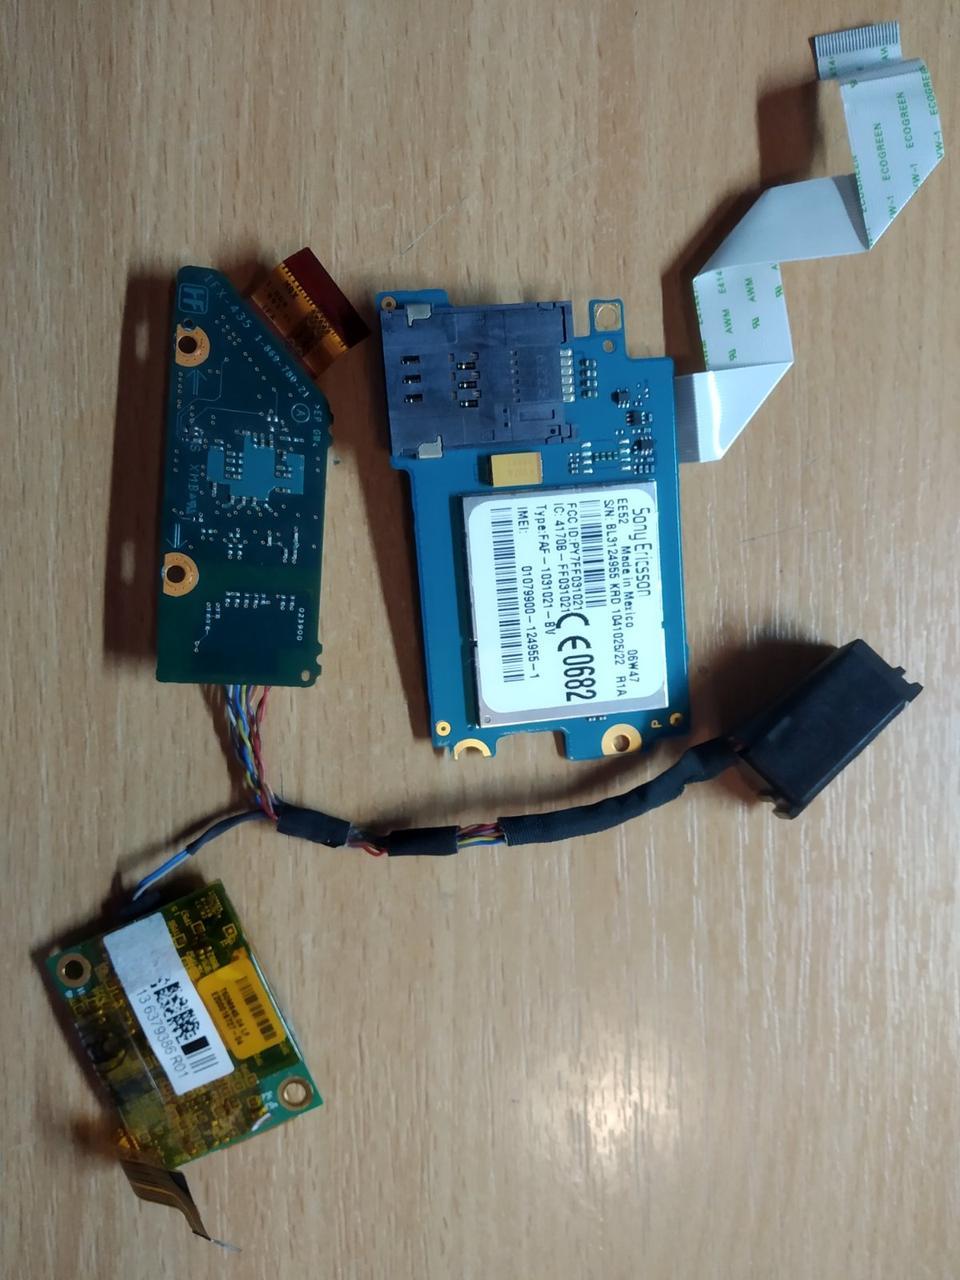 Модуль связи Sony Ericsson SIM Wifi модуль Sony Vaio VGN-SZ330P TVK1179227, 4170B-FF031021, FAF-1031021-BV